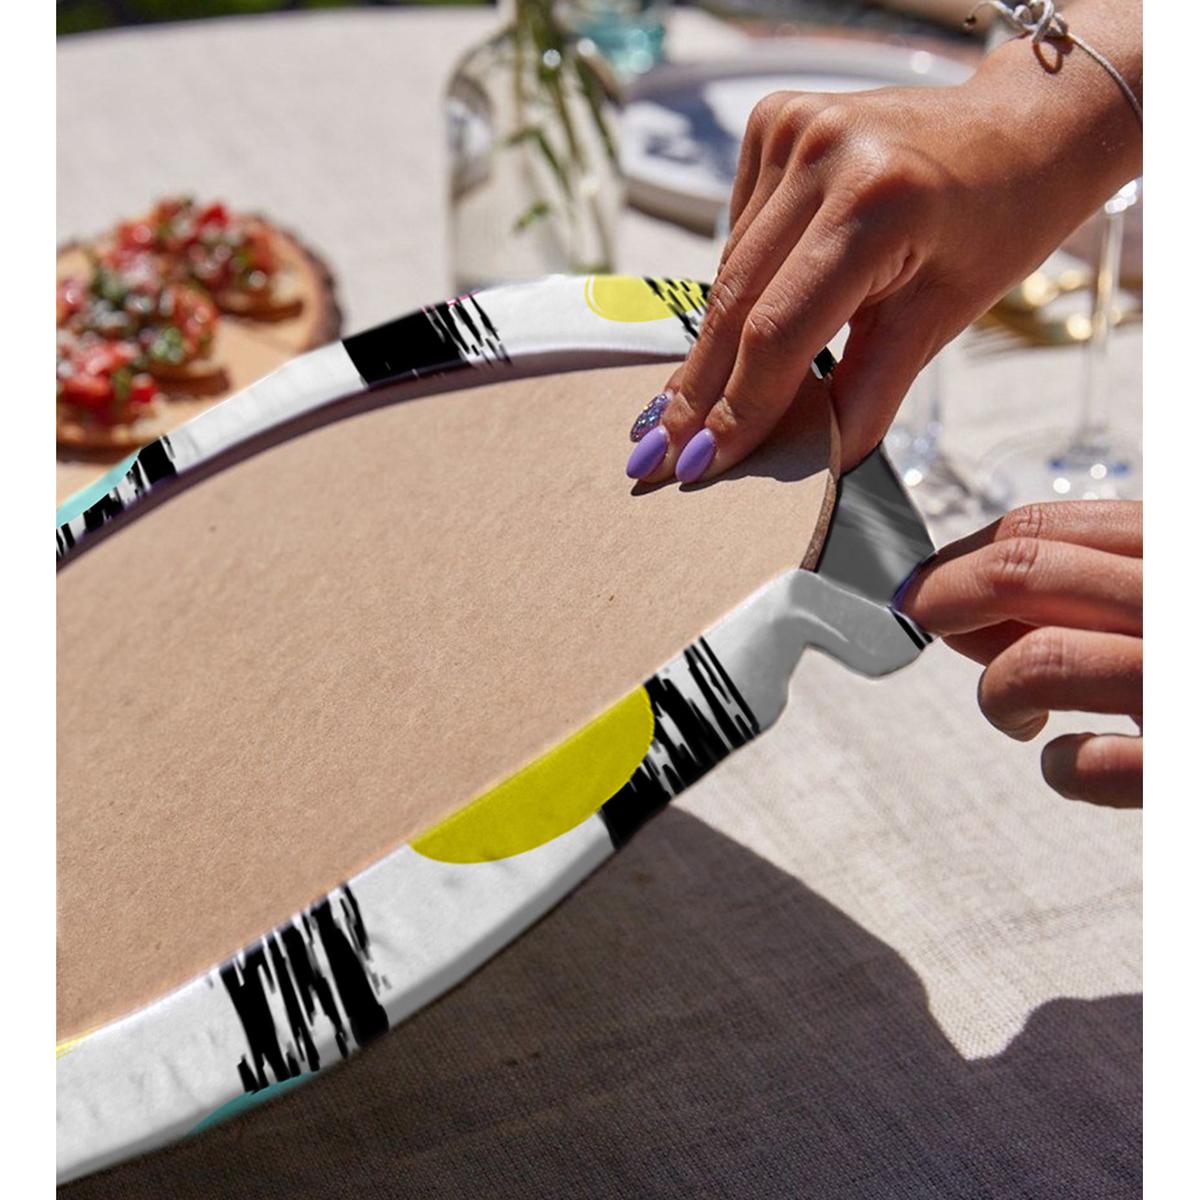 Realhomes Beyaz Zeminli Renkli Puantiye Desenli Dijital Baskılı Modern 2'li Yuvarlak Servis Altlığı - Supla Realhomes